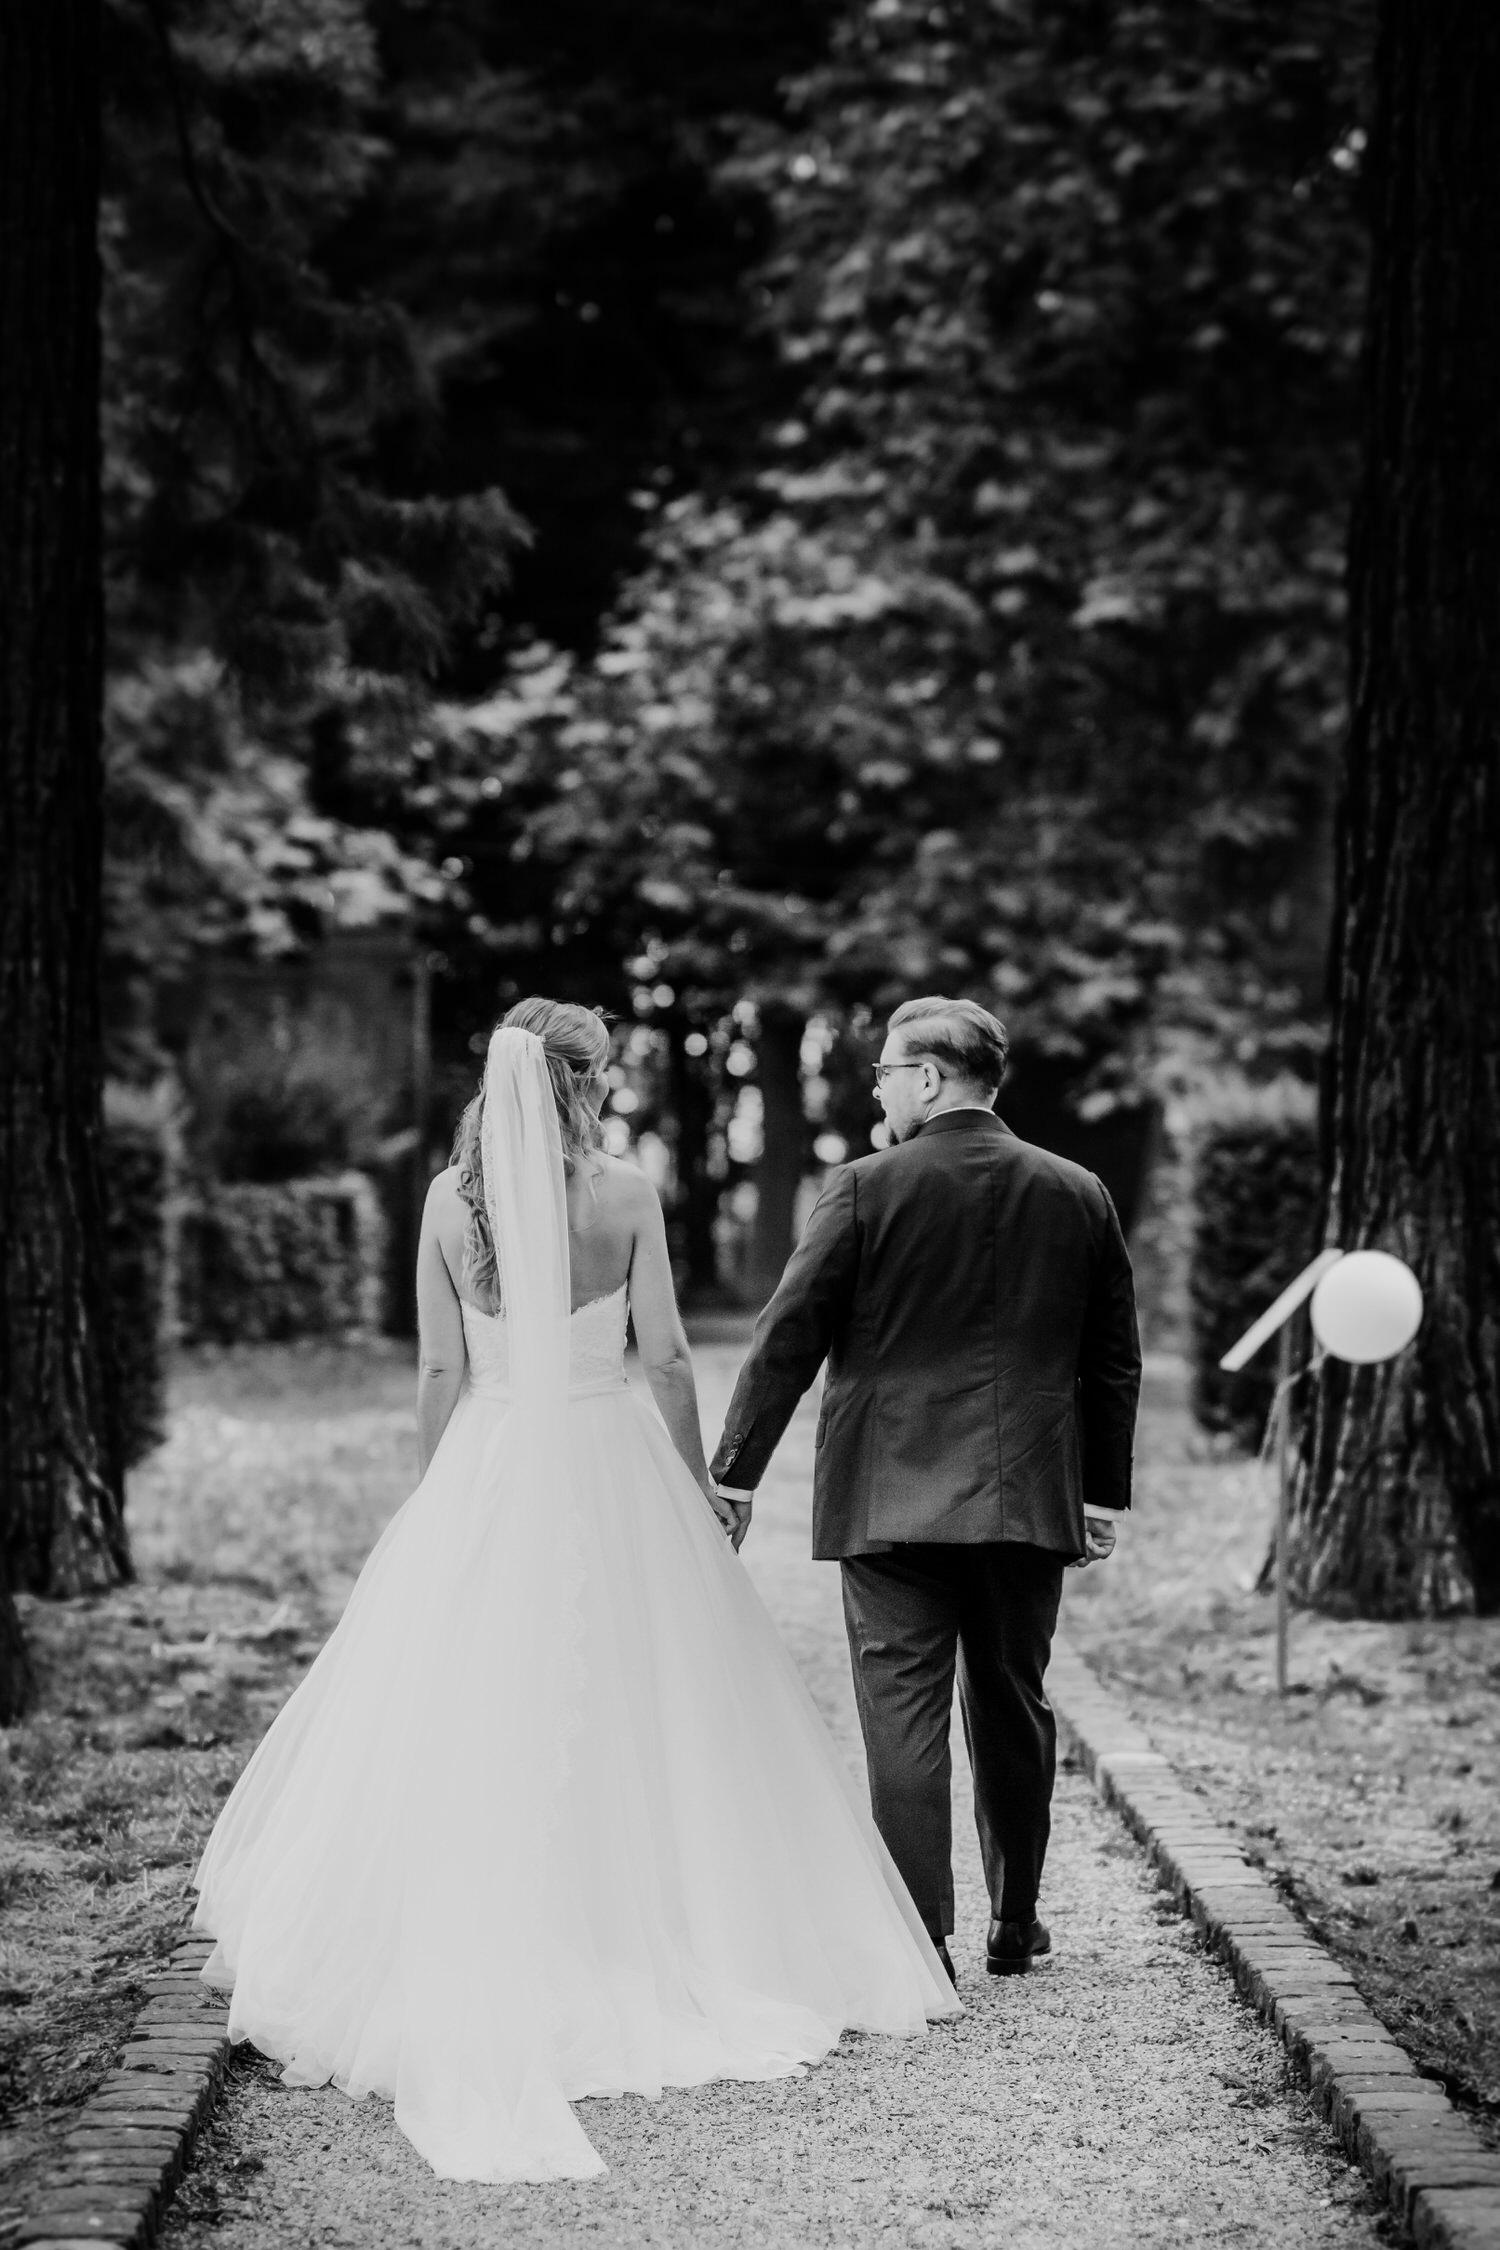 Brautpaarfotoshooting